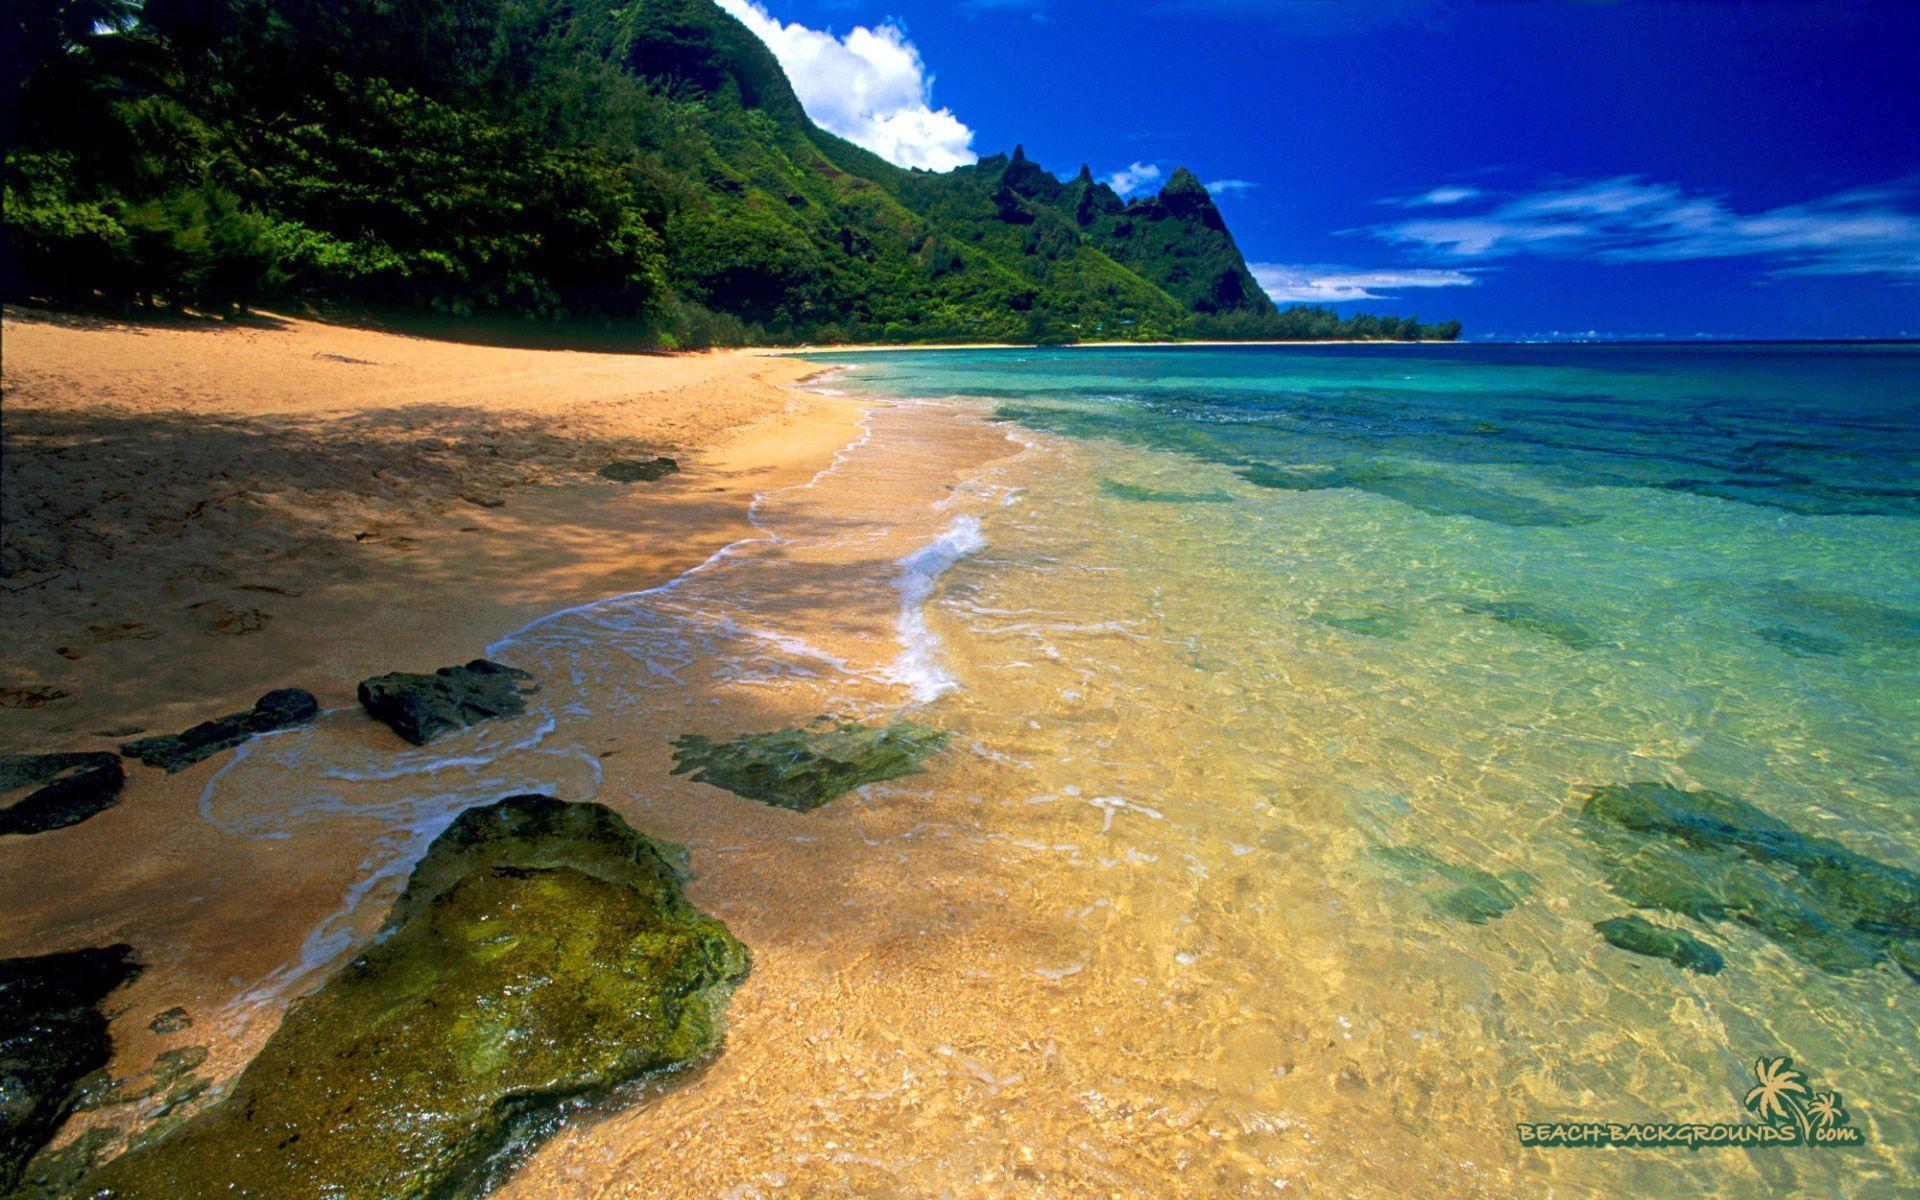 beach background pics